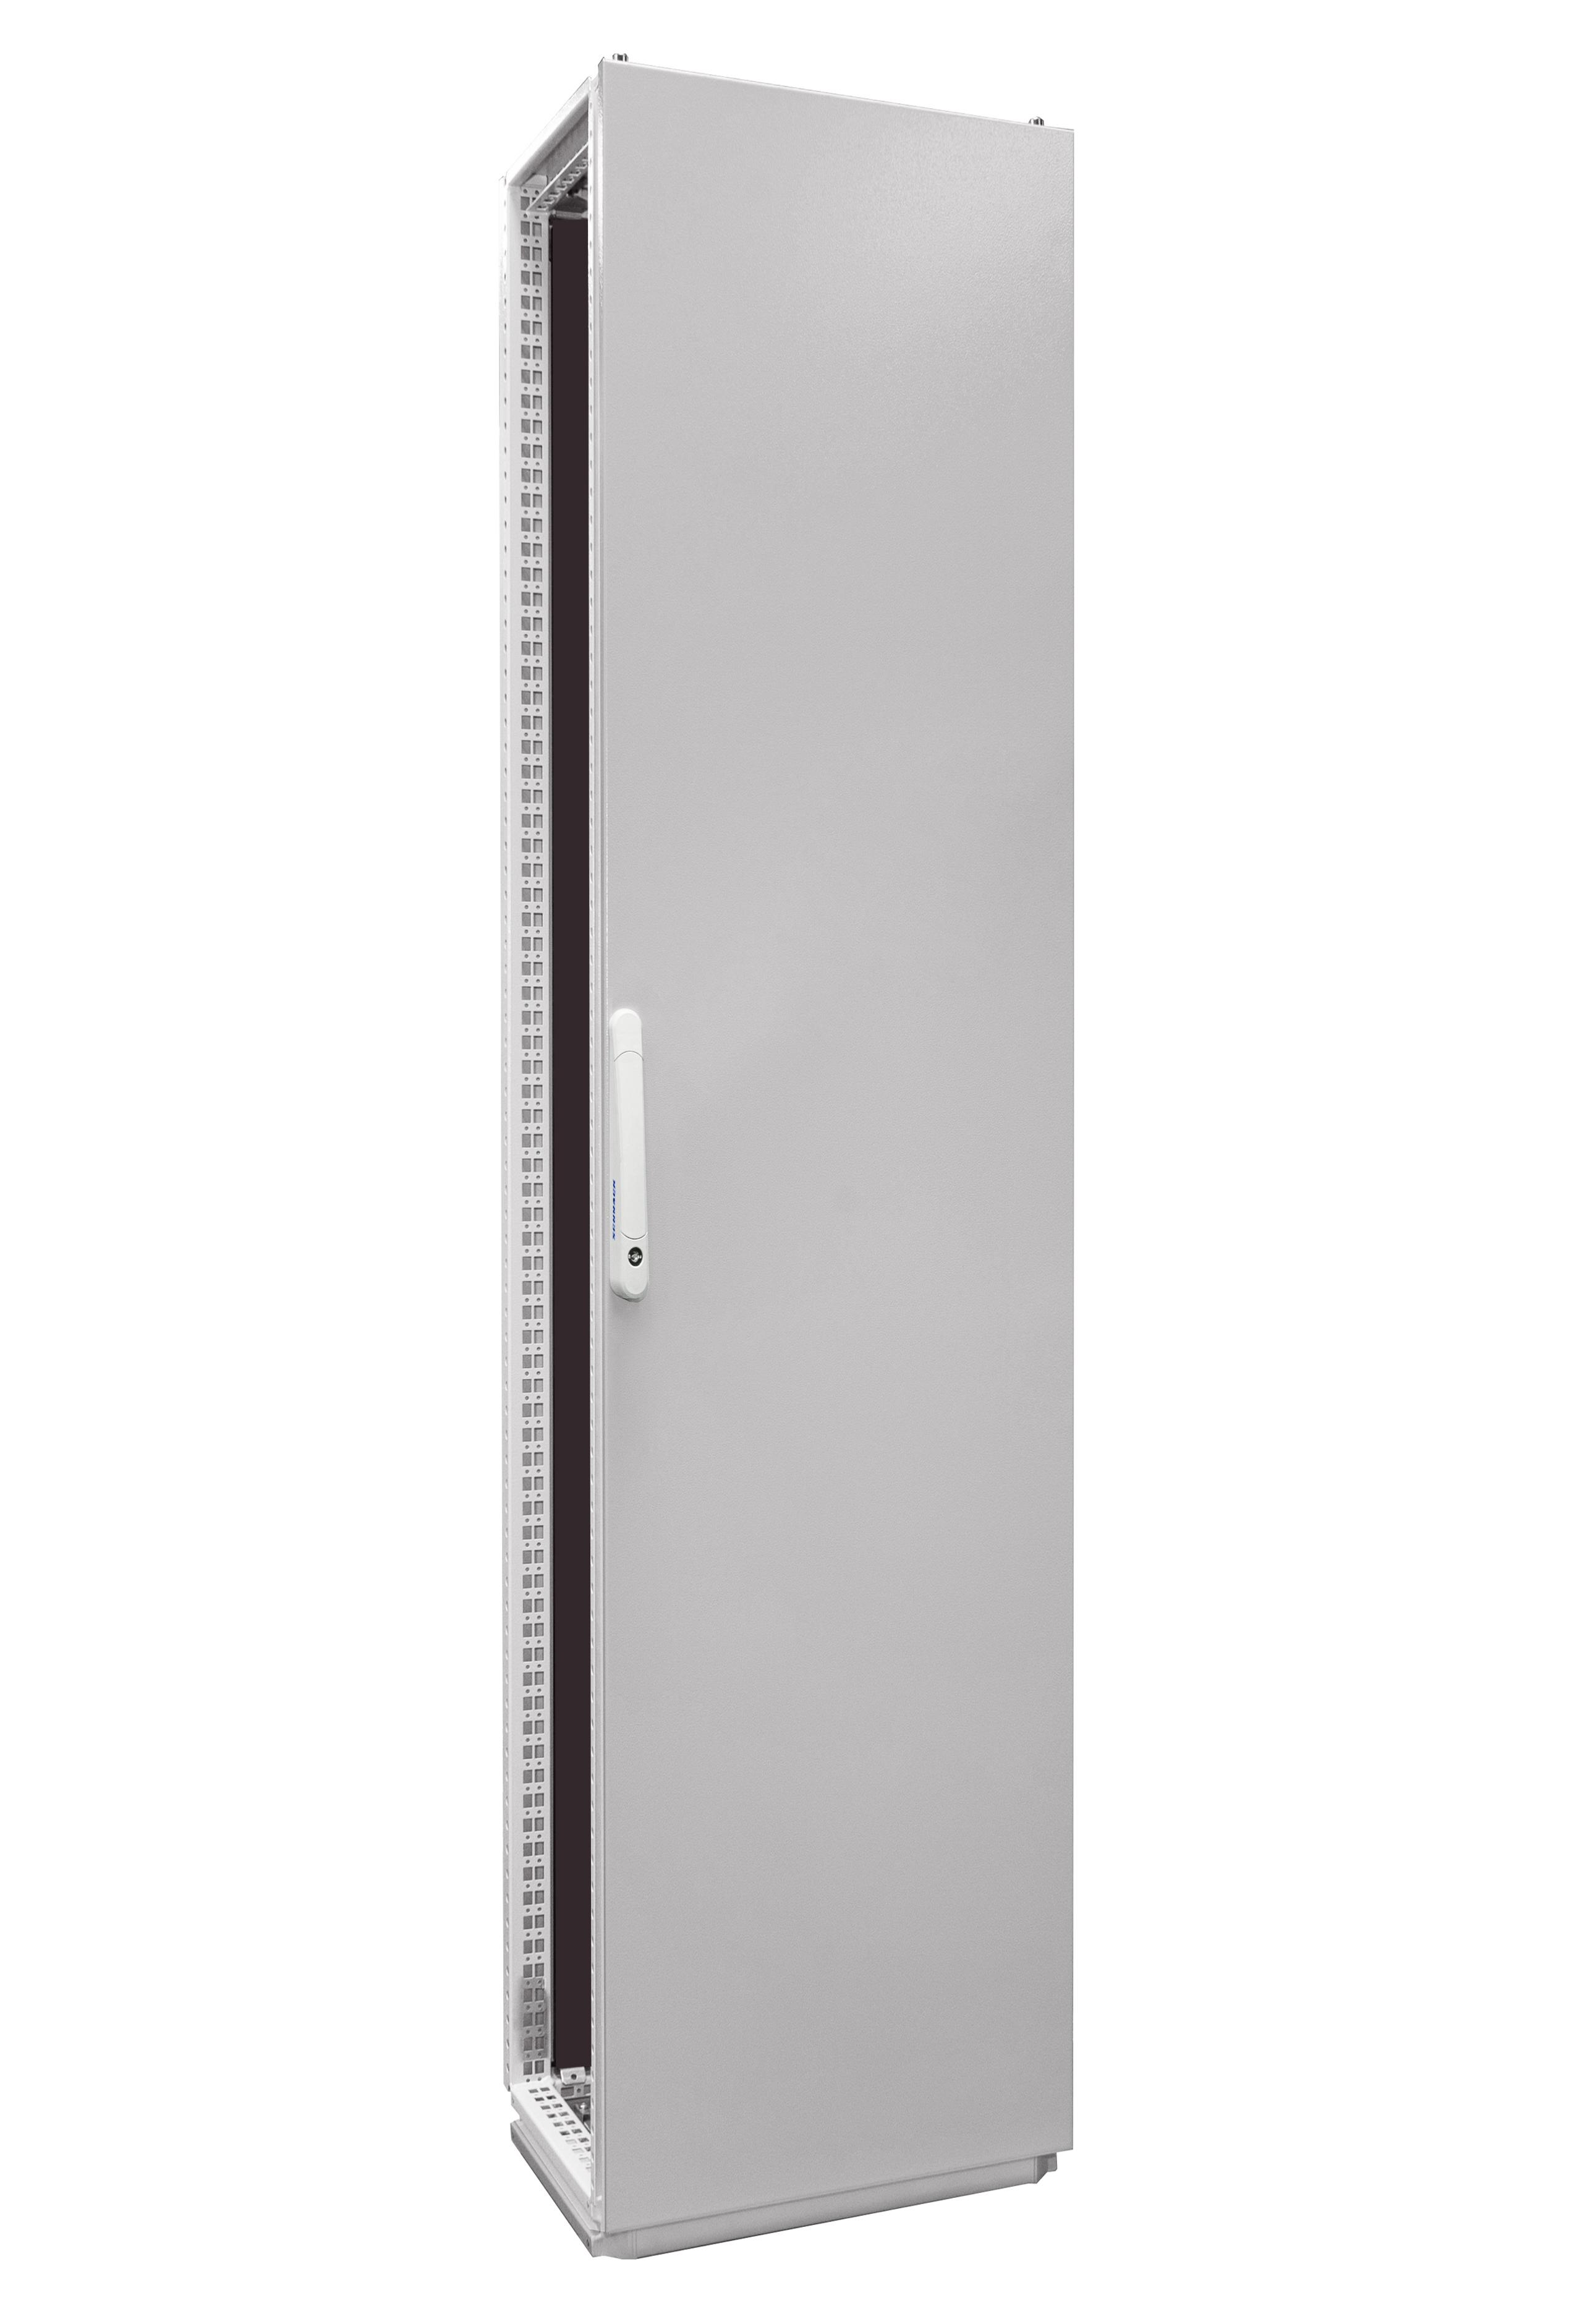 1 Stk Anreihschrank 1-Tür IP55 H=2000 B=400 T=400mm Stahlblech AC204041--